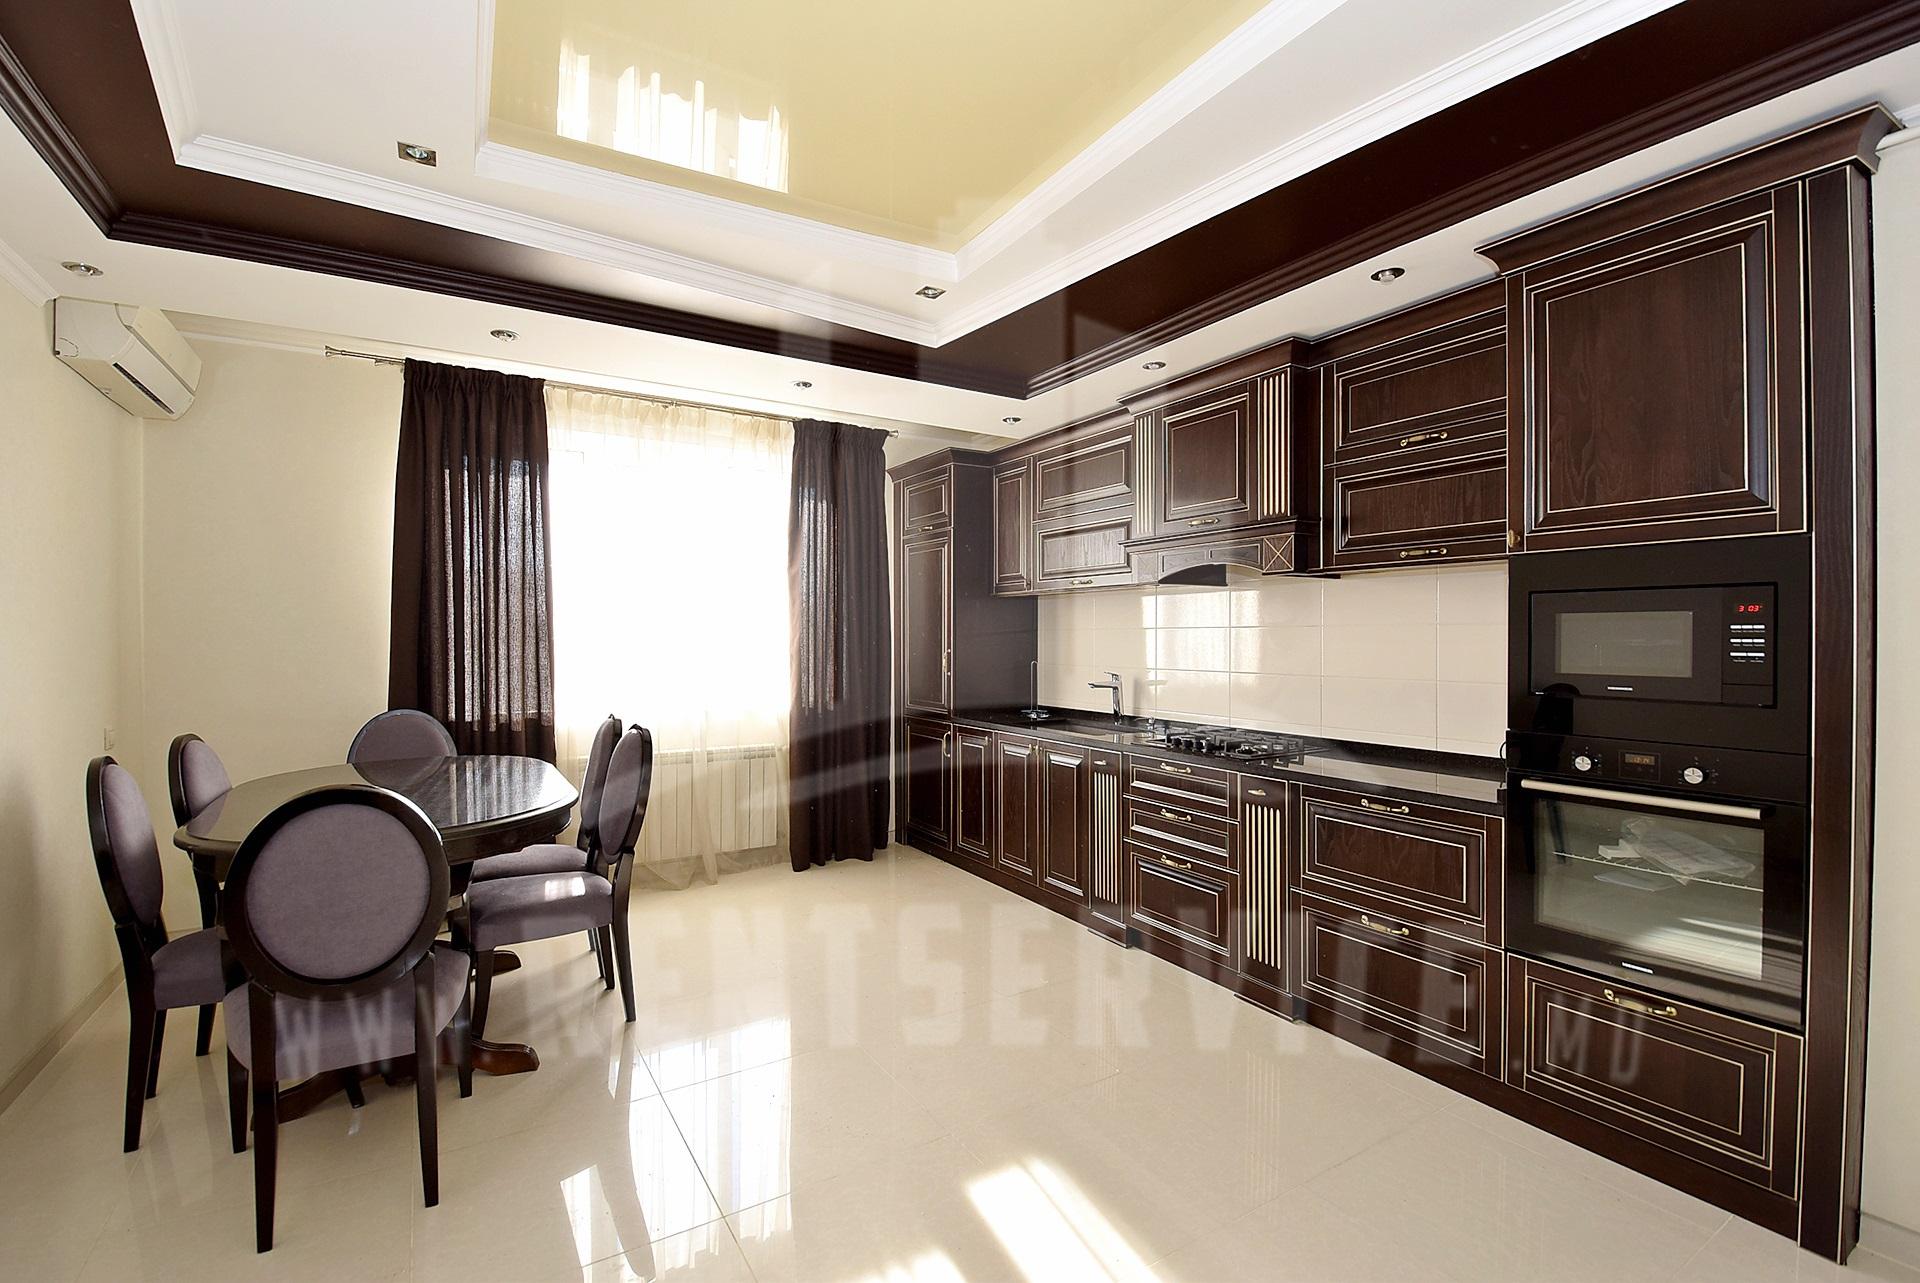 290_apartment_2.JPG